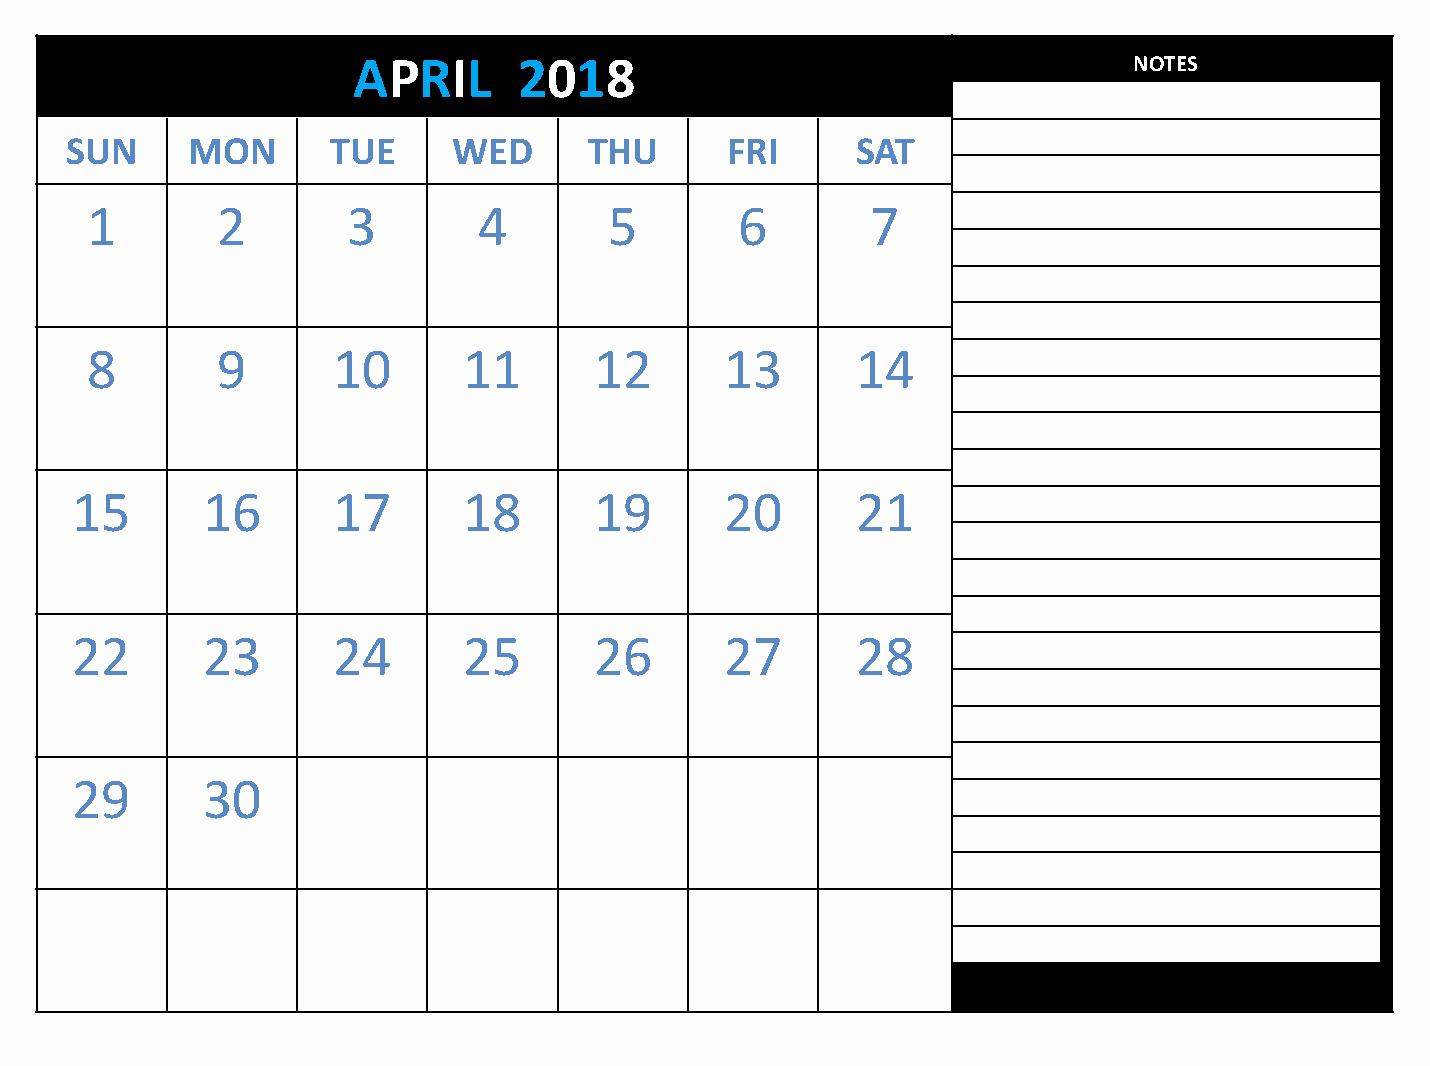 Printable Calendar 2018 with Notes Awesome April 2018 Calendar Printable [free]